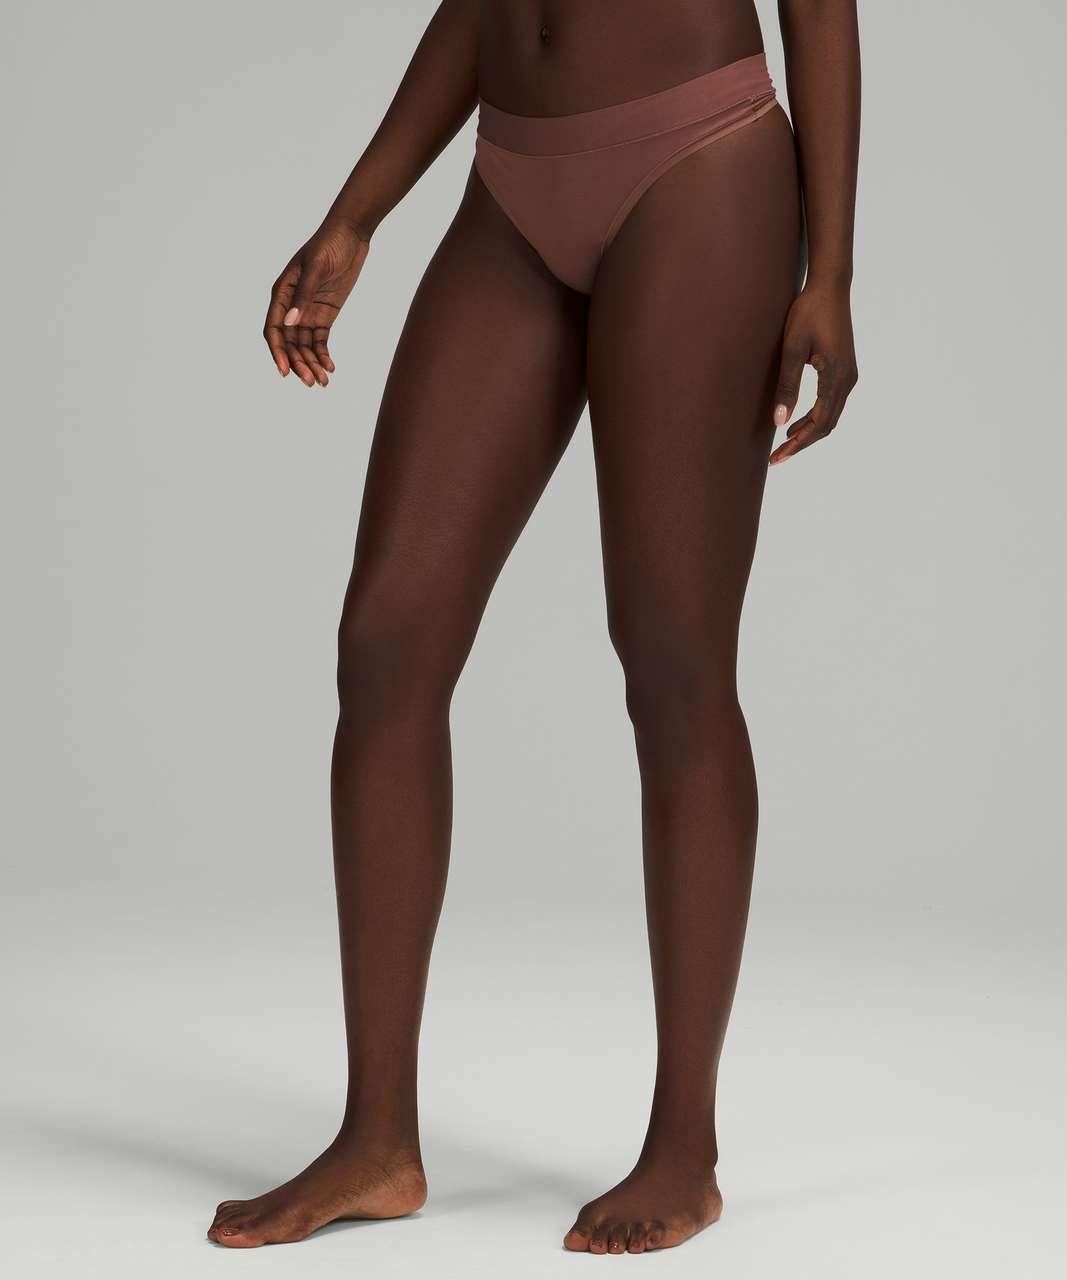 Lululemon UnderEase Mid-Rise Thong Underwear - Smoky Topaz